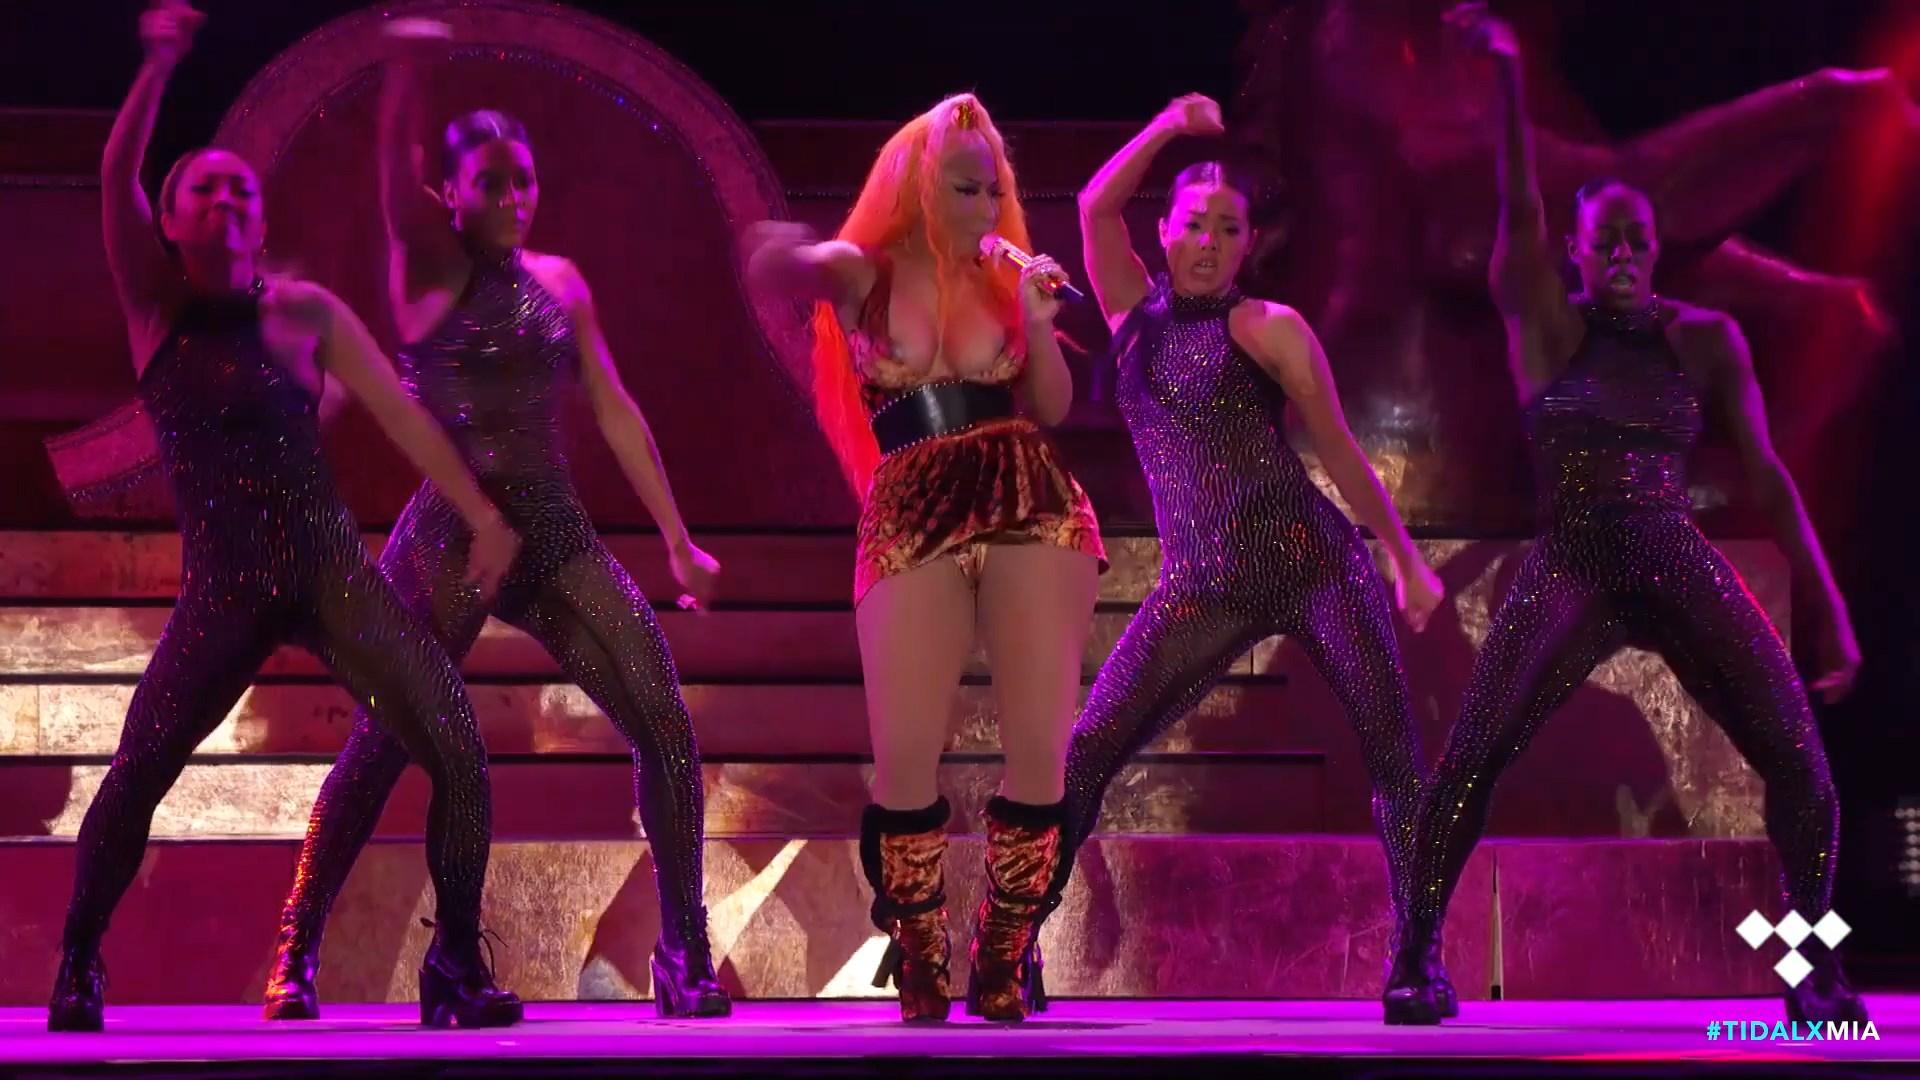 Nicki-Minaj-Nude-TheFappeningBlog.com-21.jpg